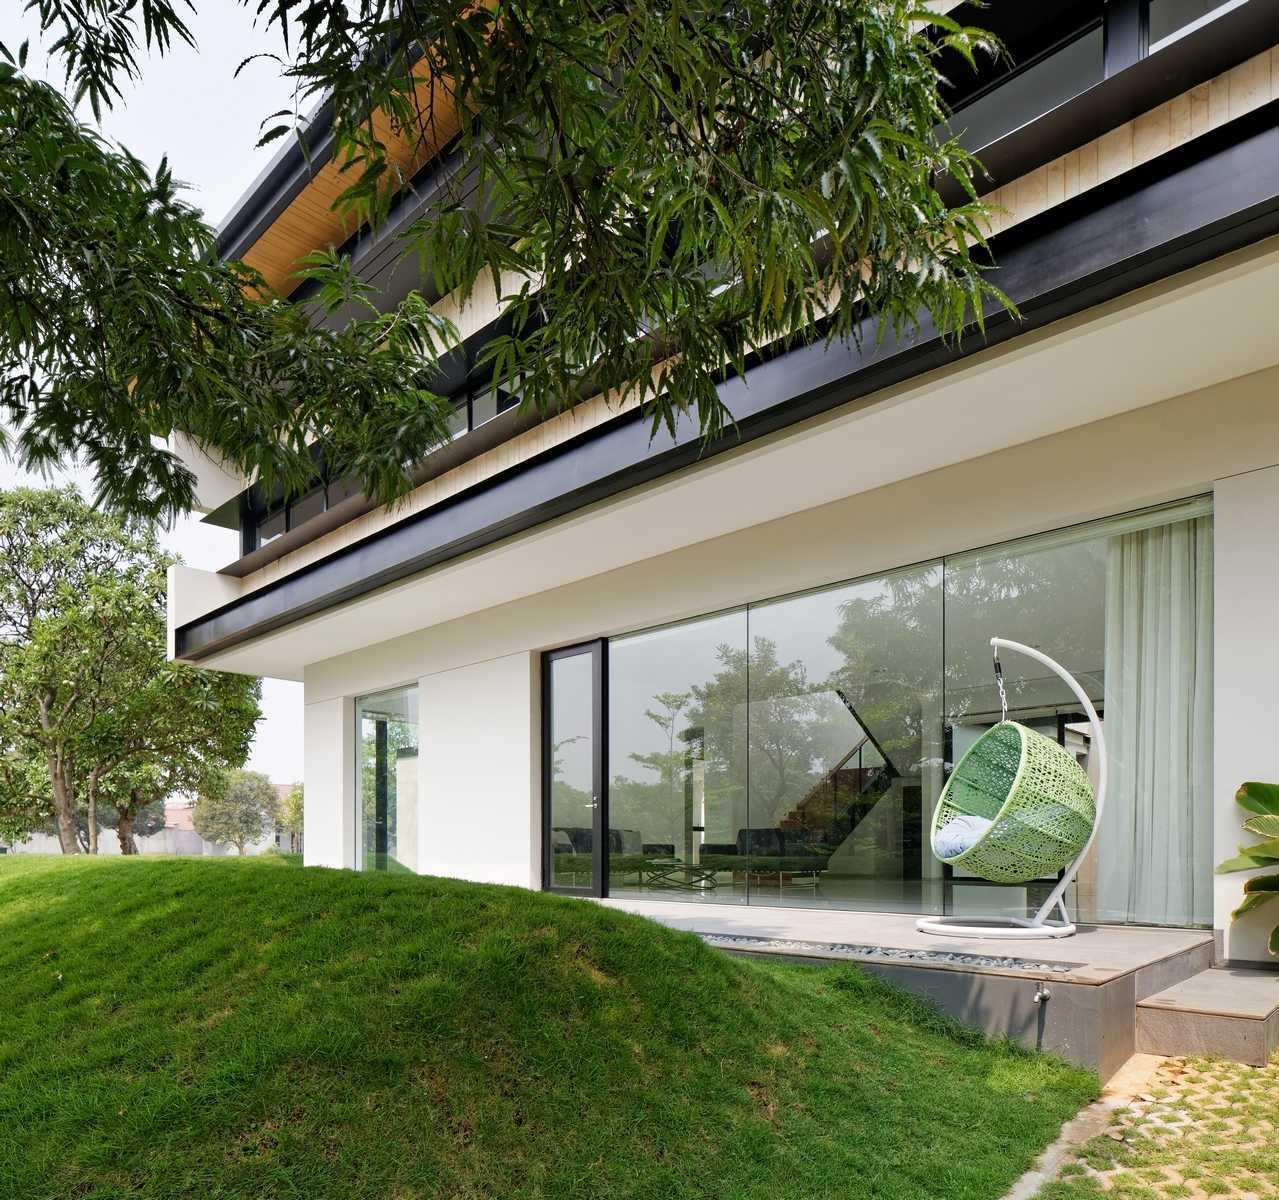 Axialstudio Rs House Alam Sutera - Tangerang Alam Sutera - Tangerang Exterior View Modern  29249